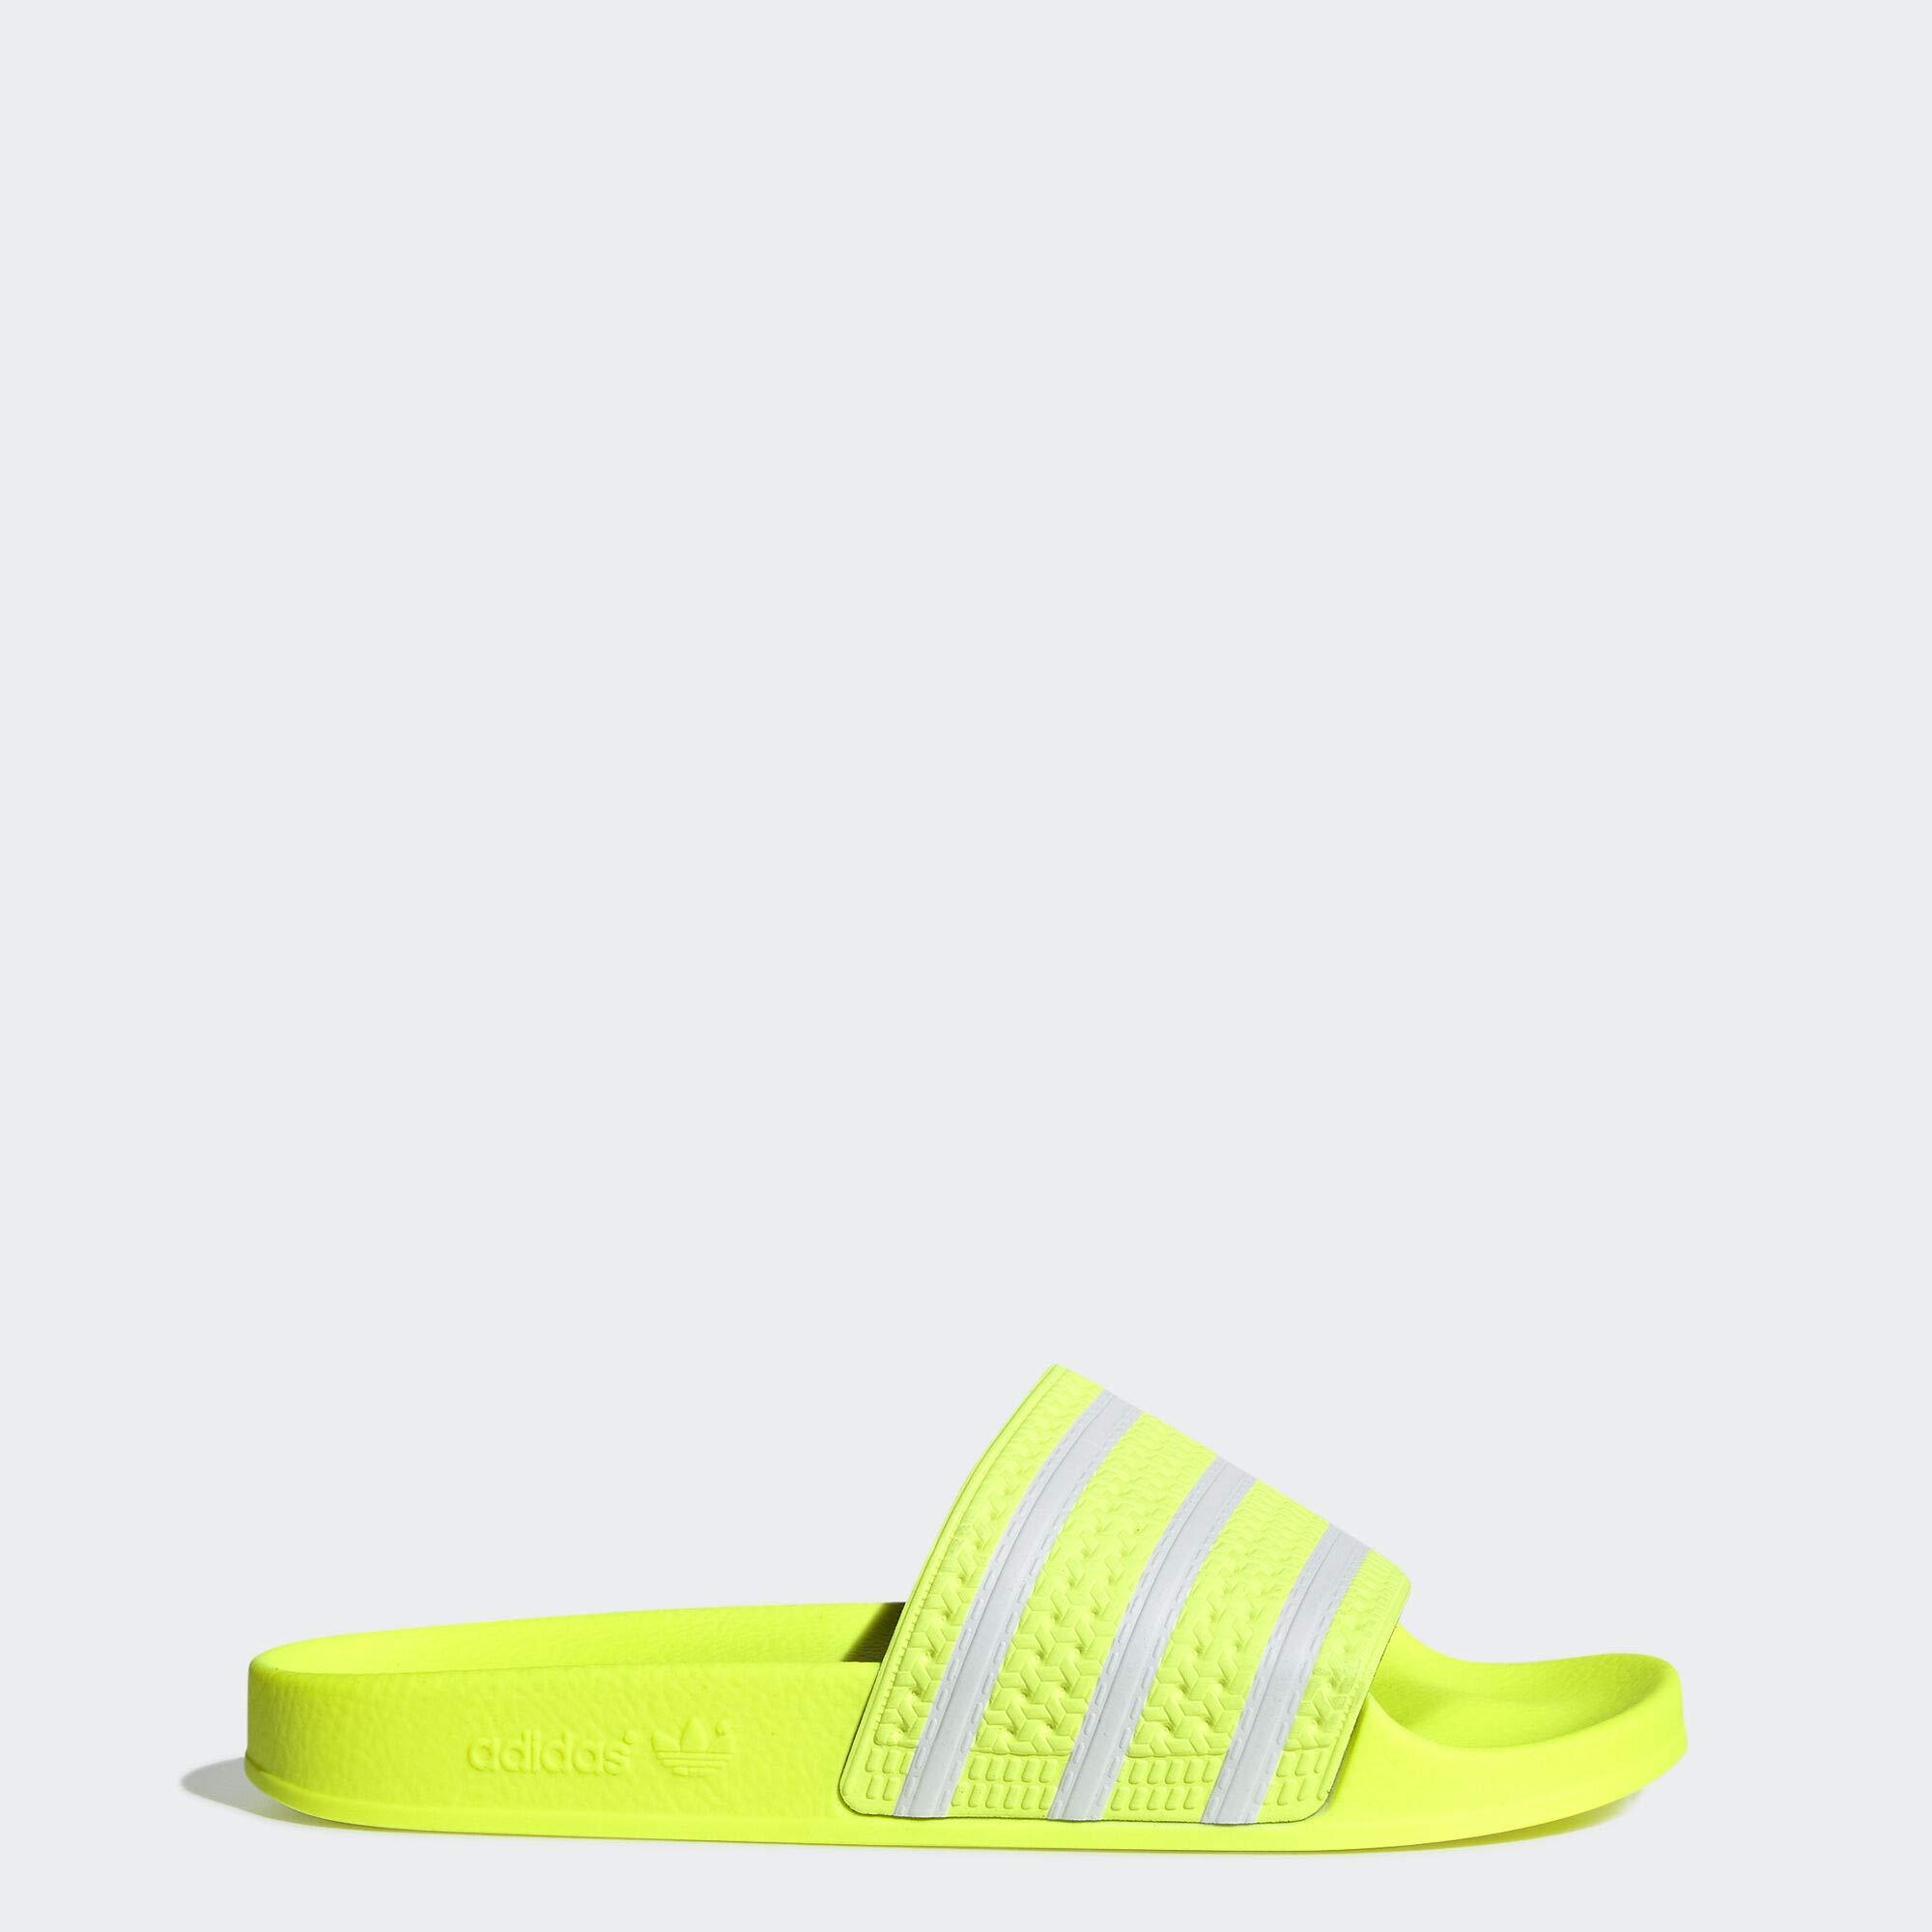 adidas Originals Men's Adilette Slide Sandal, White/Solar Yellow, 11 M US by adidas Originals